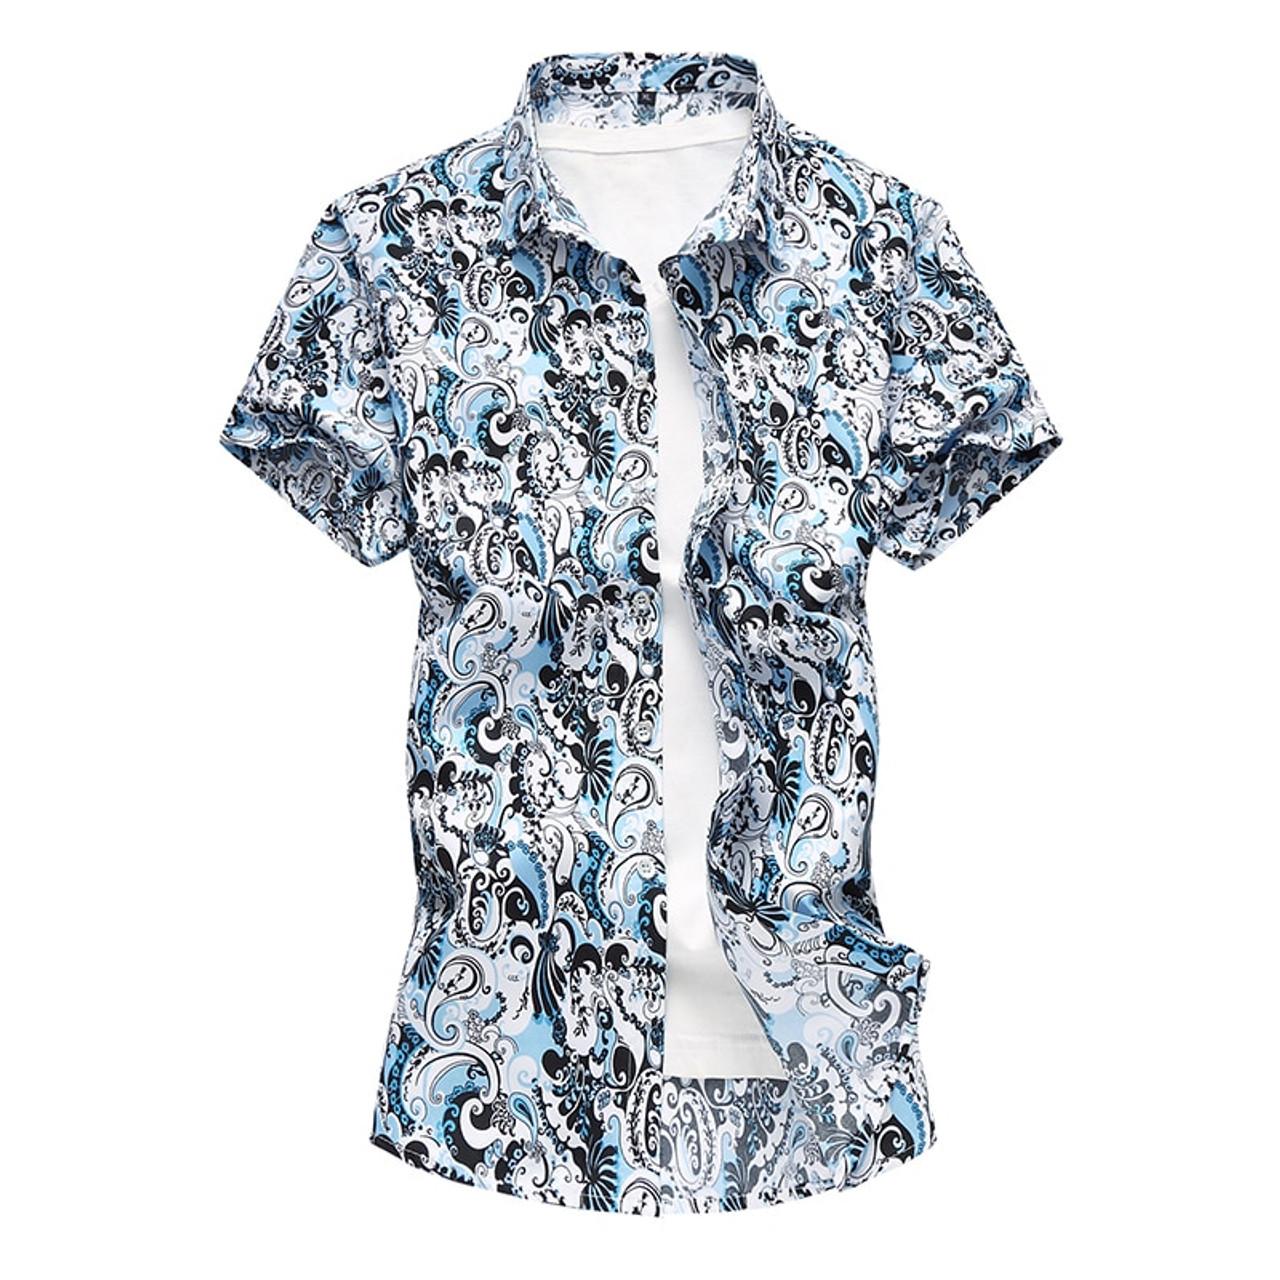 c0e032135b7 ... Summer Mens Short Sleeve Beach Hawaiian Shirts Cotton Casual Floral  Shirts Plus Size 7XL 2018 New ...